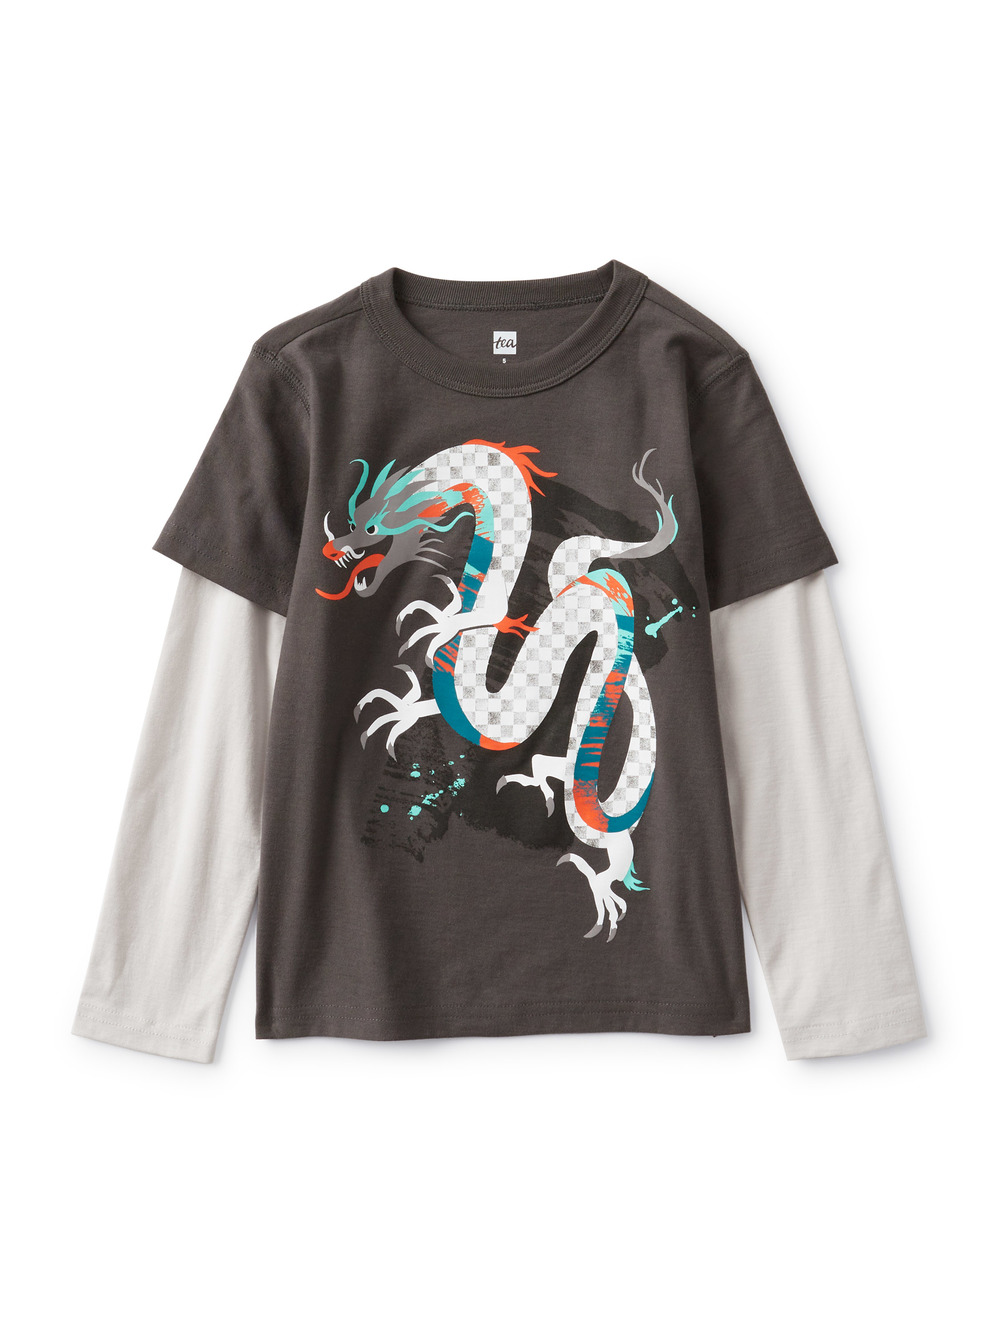 Dragon Layered Graphic Tee